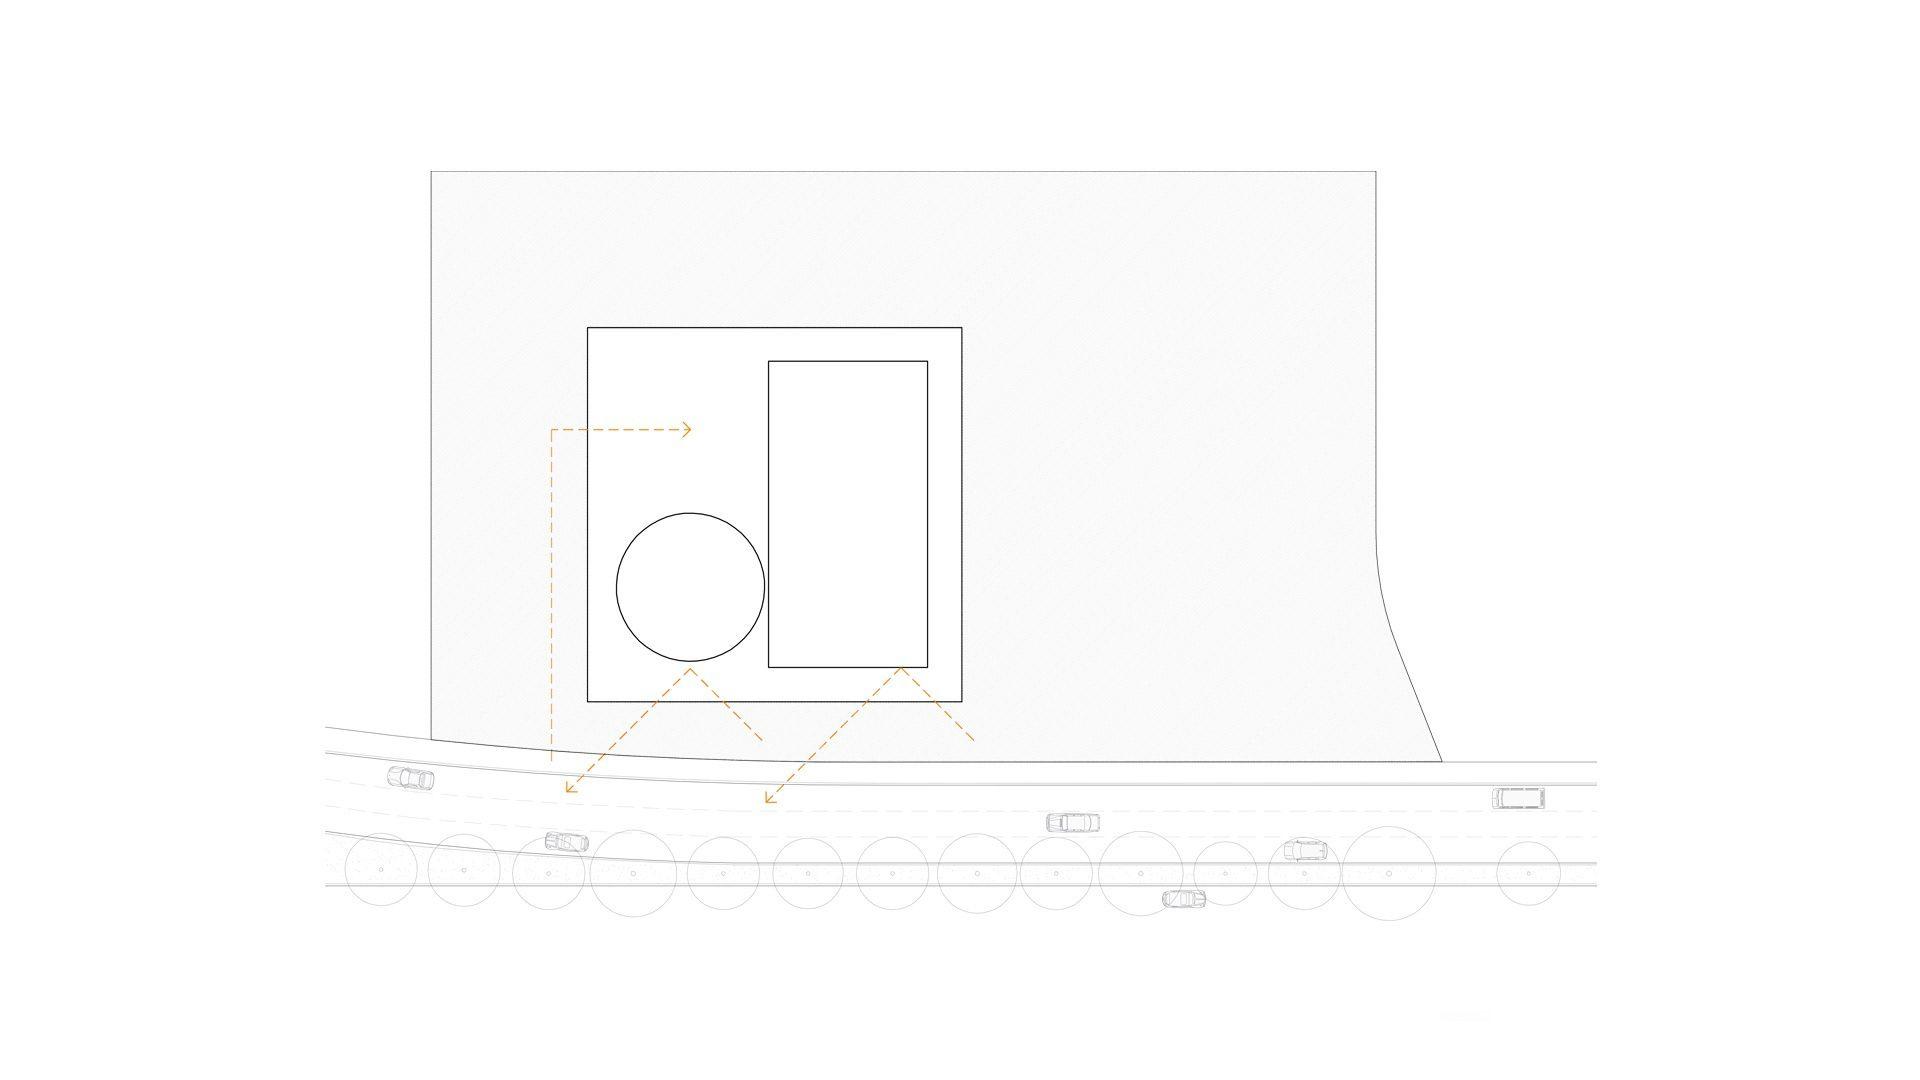 midiateca-santo-andre-diagrama-acessos-existentes